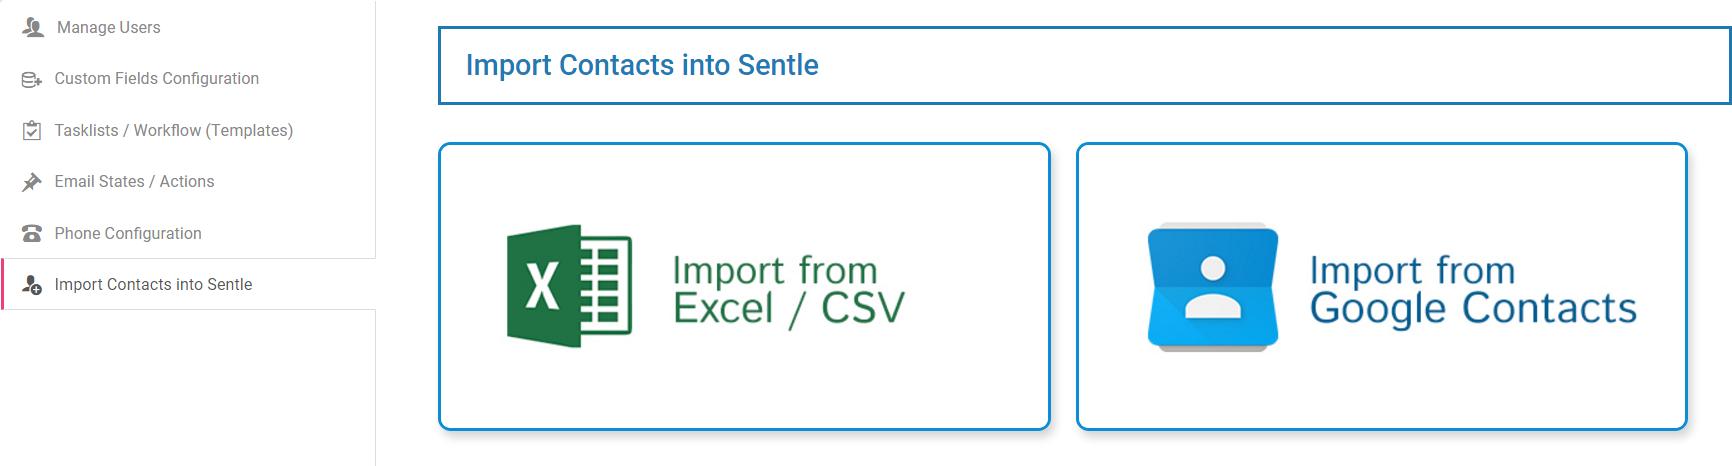 Contact_Import_-_Company_Config.png